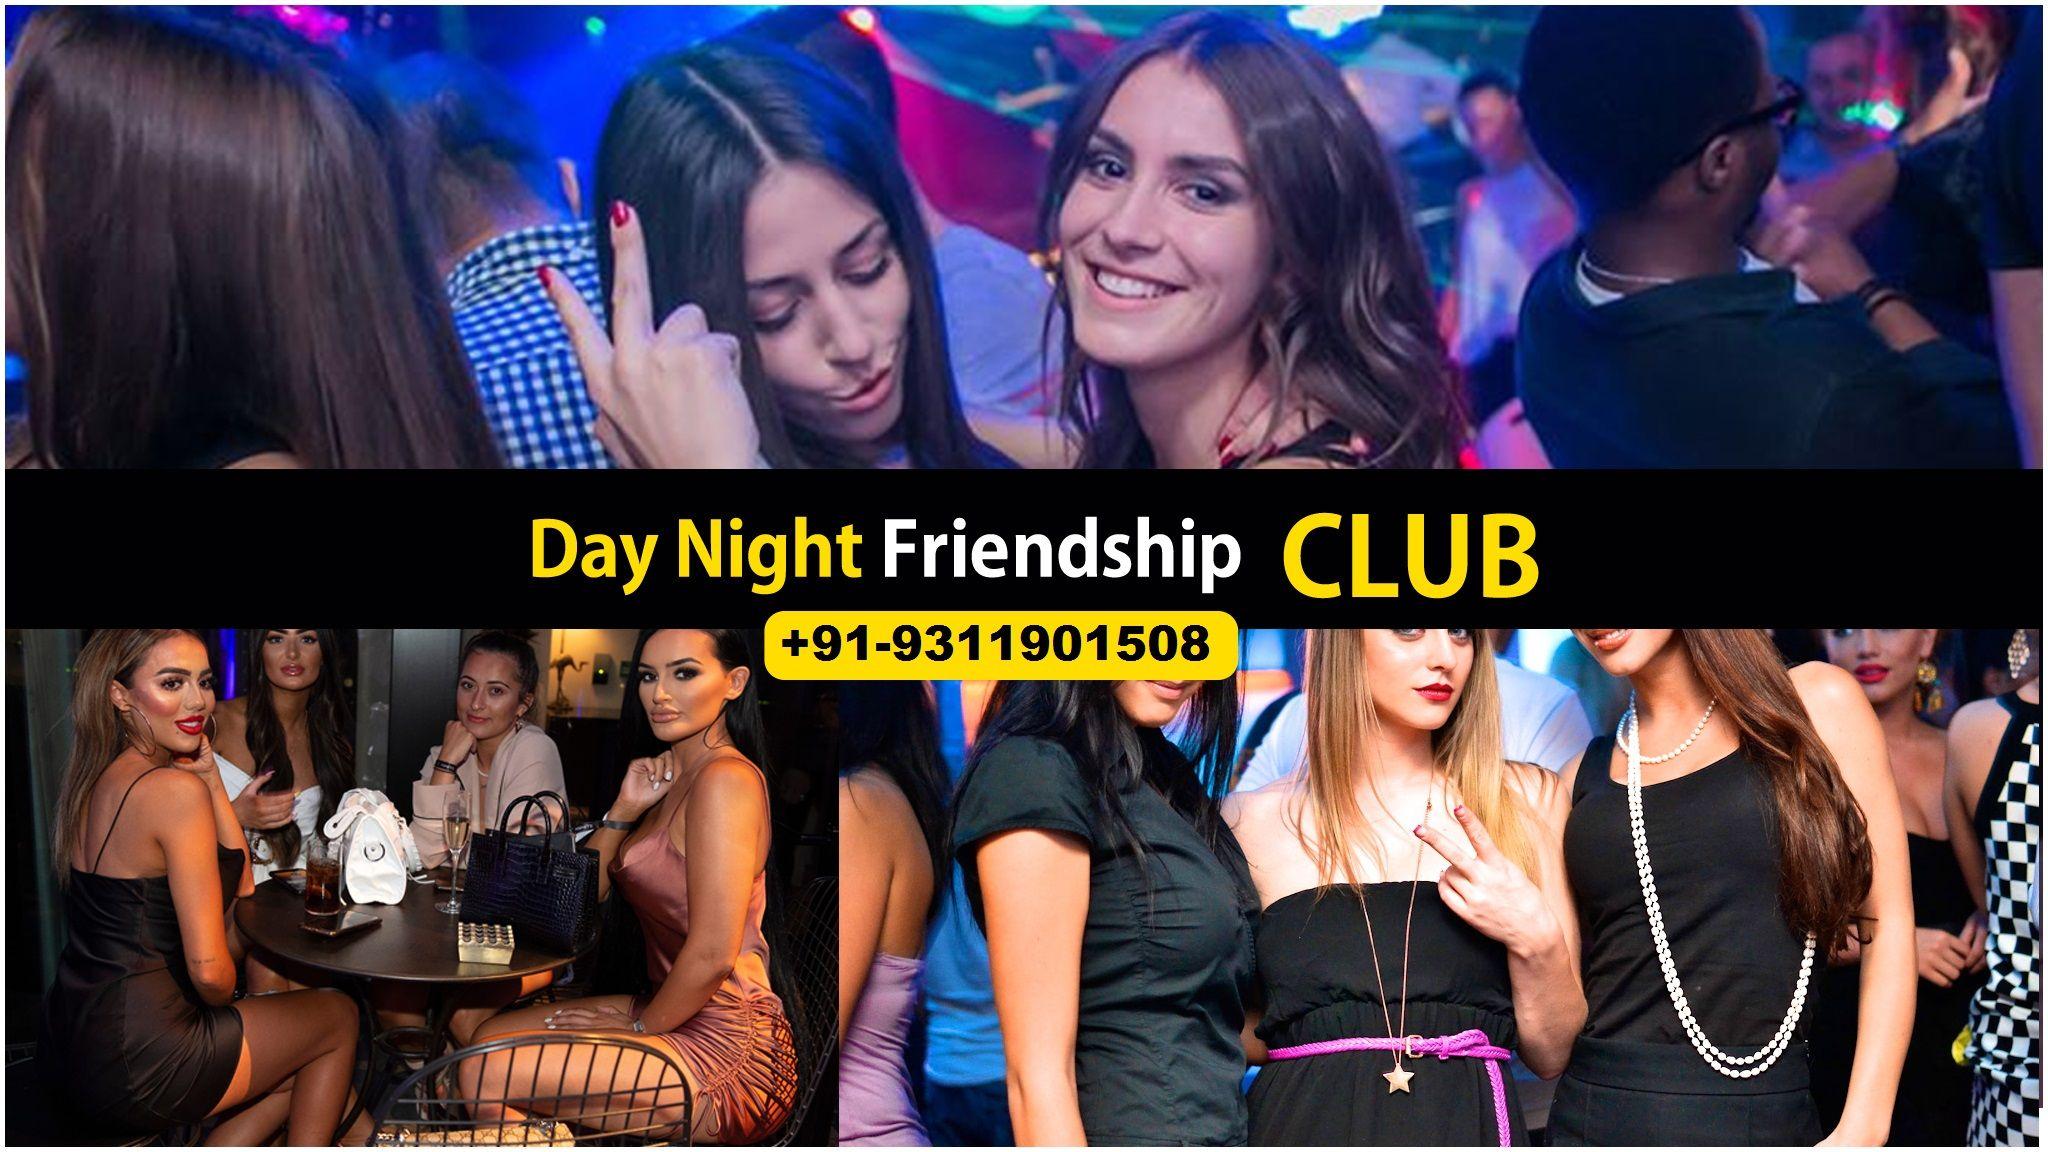 Real Friendship Dating Romance - Day Night Friendship Club